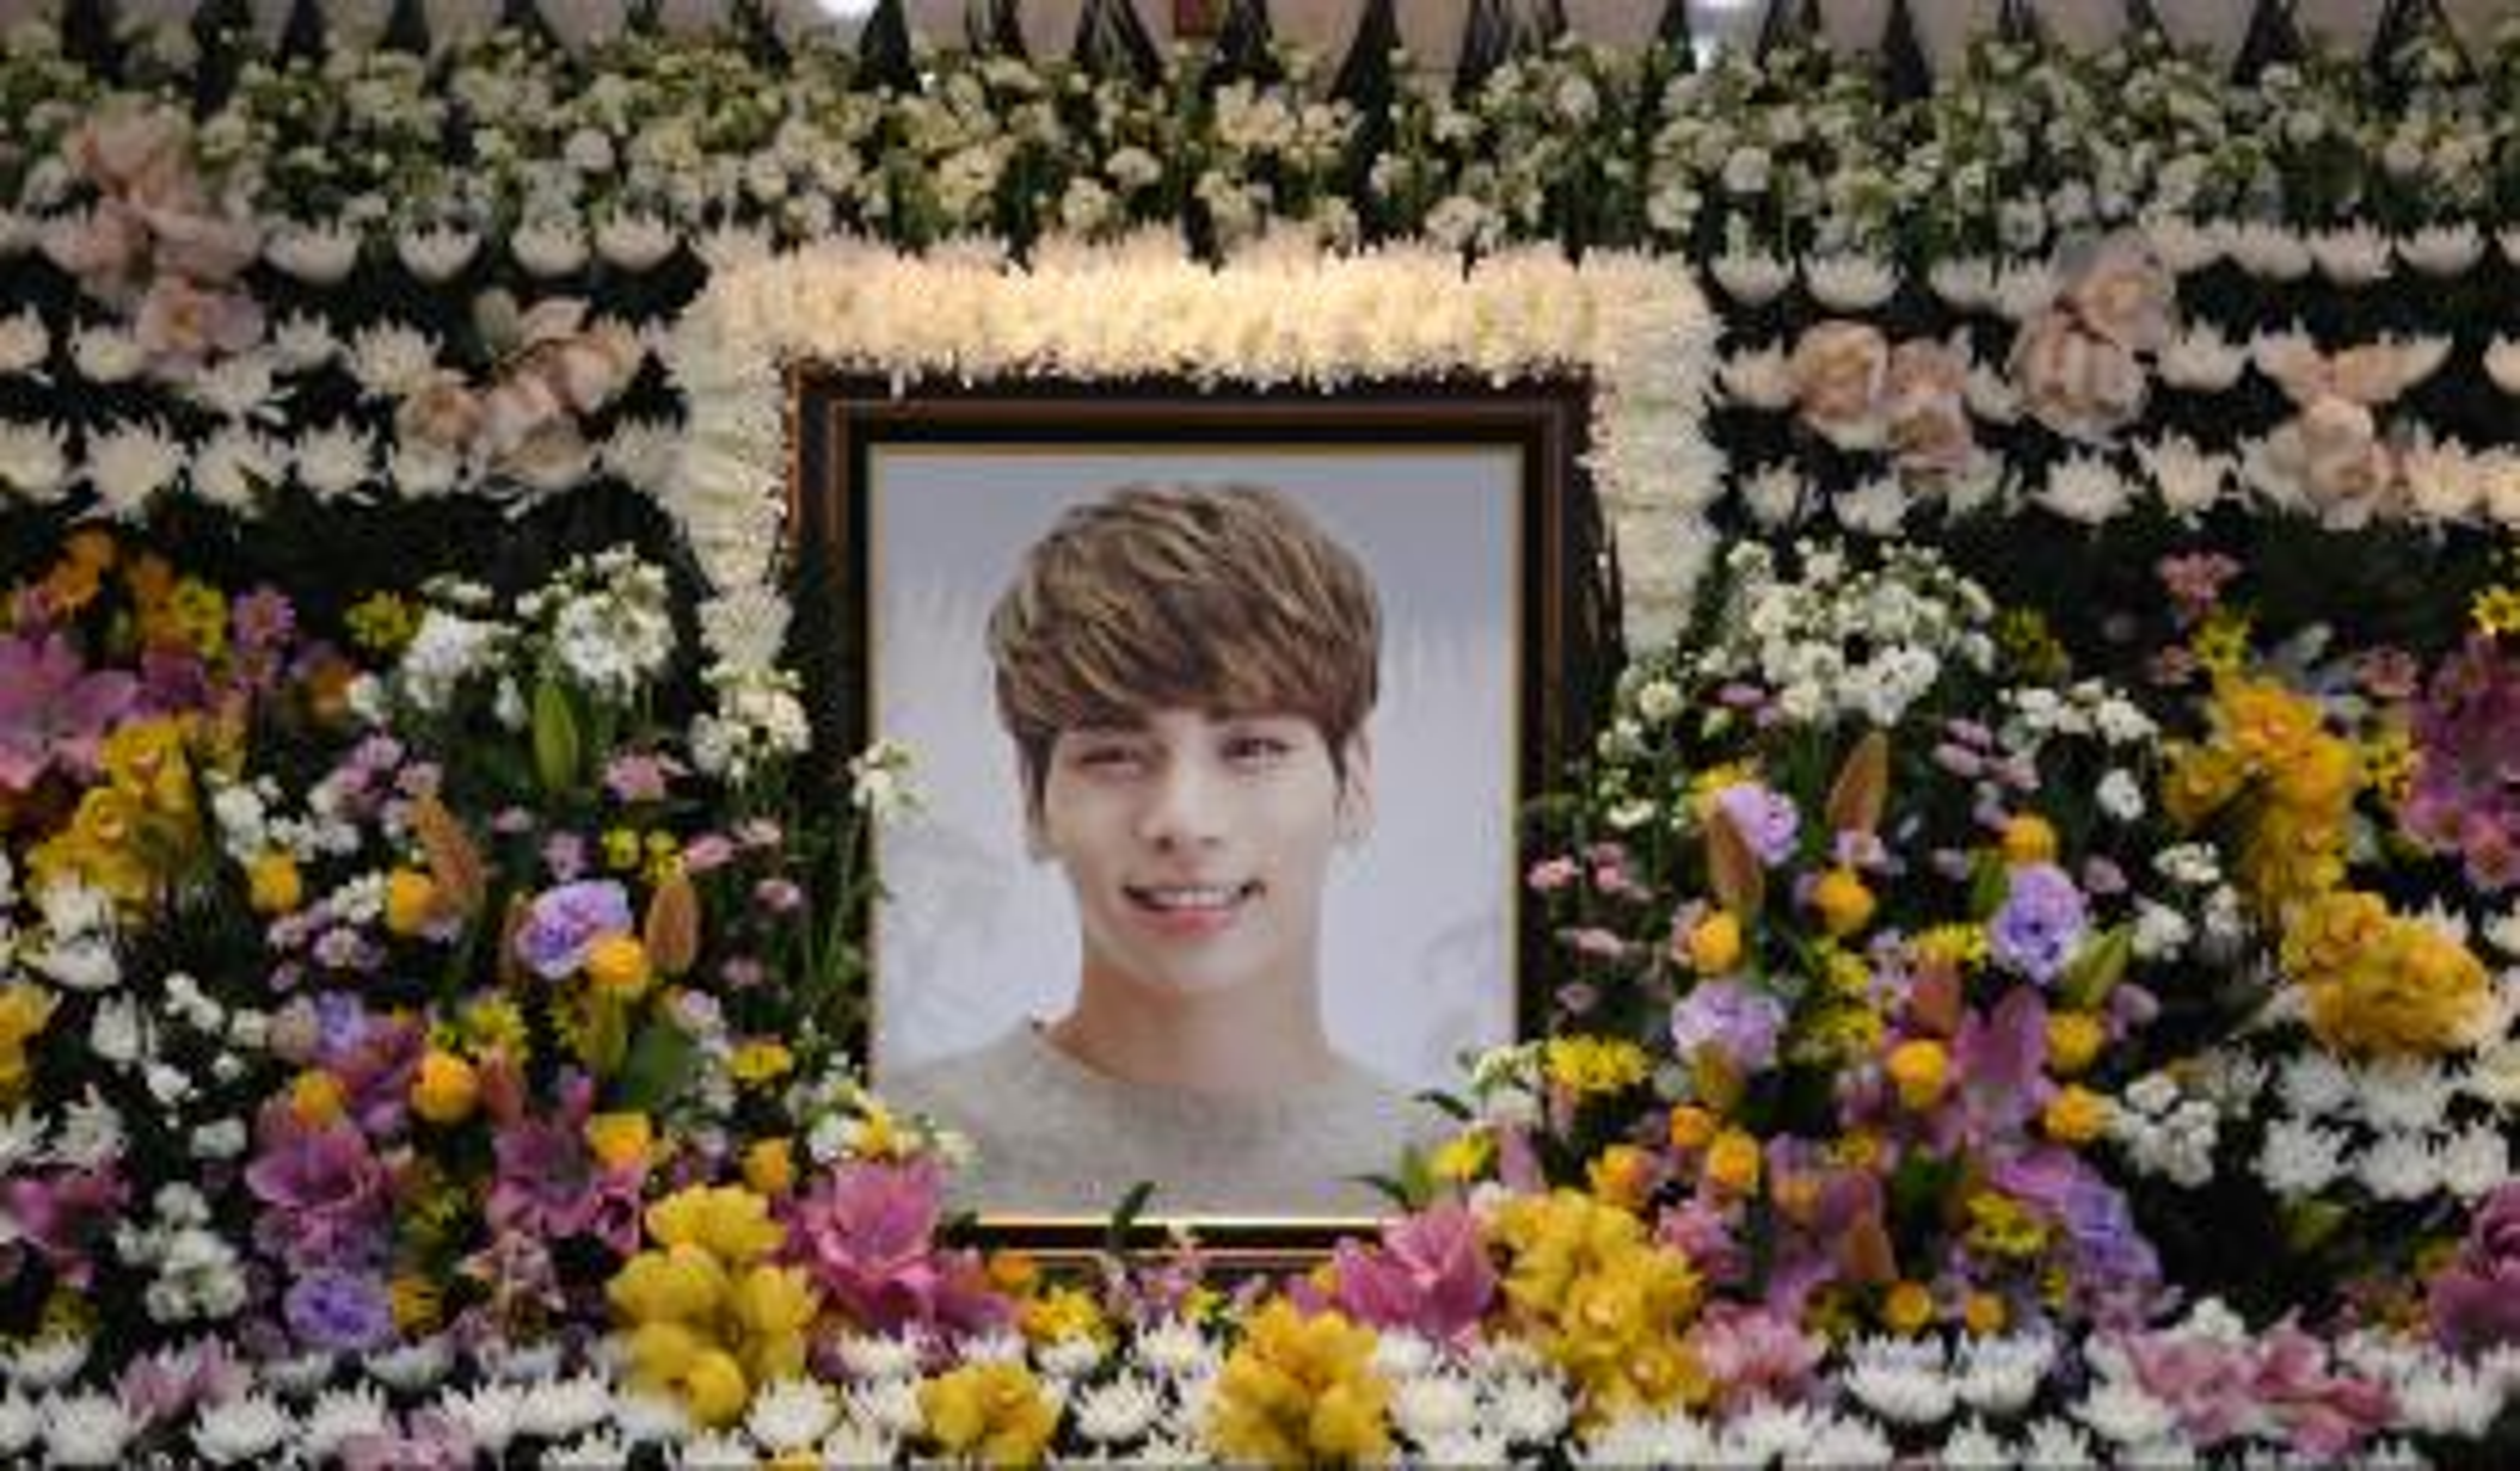 Suicide of SHINee's Jonghyun prompts Korea to confront grueling Kpop